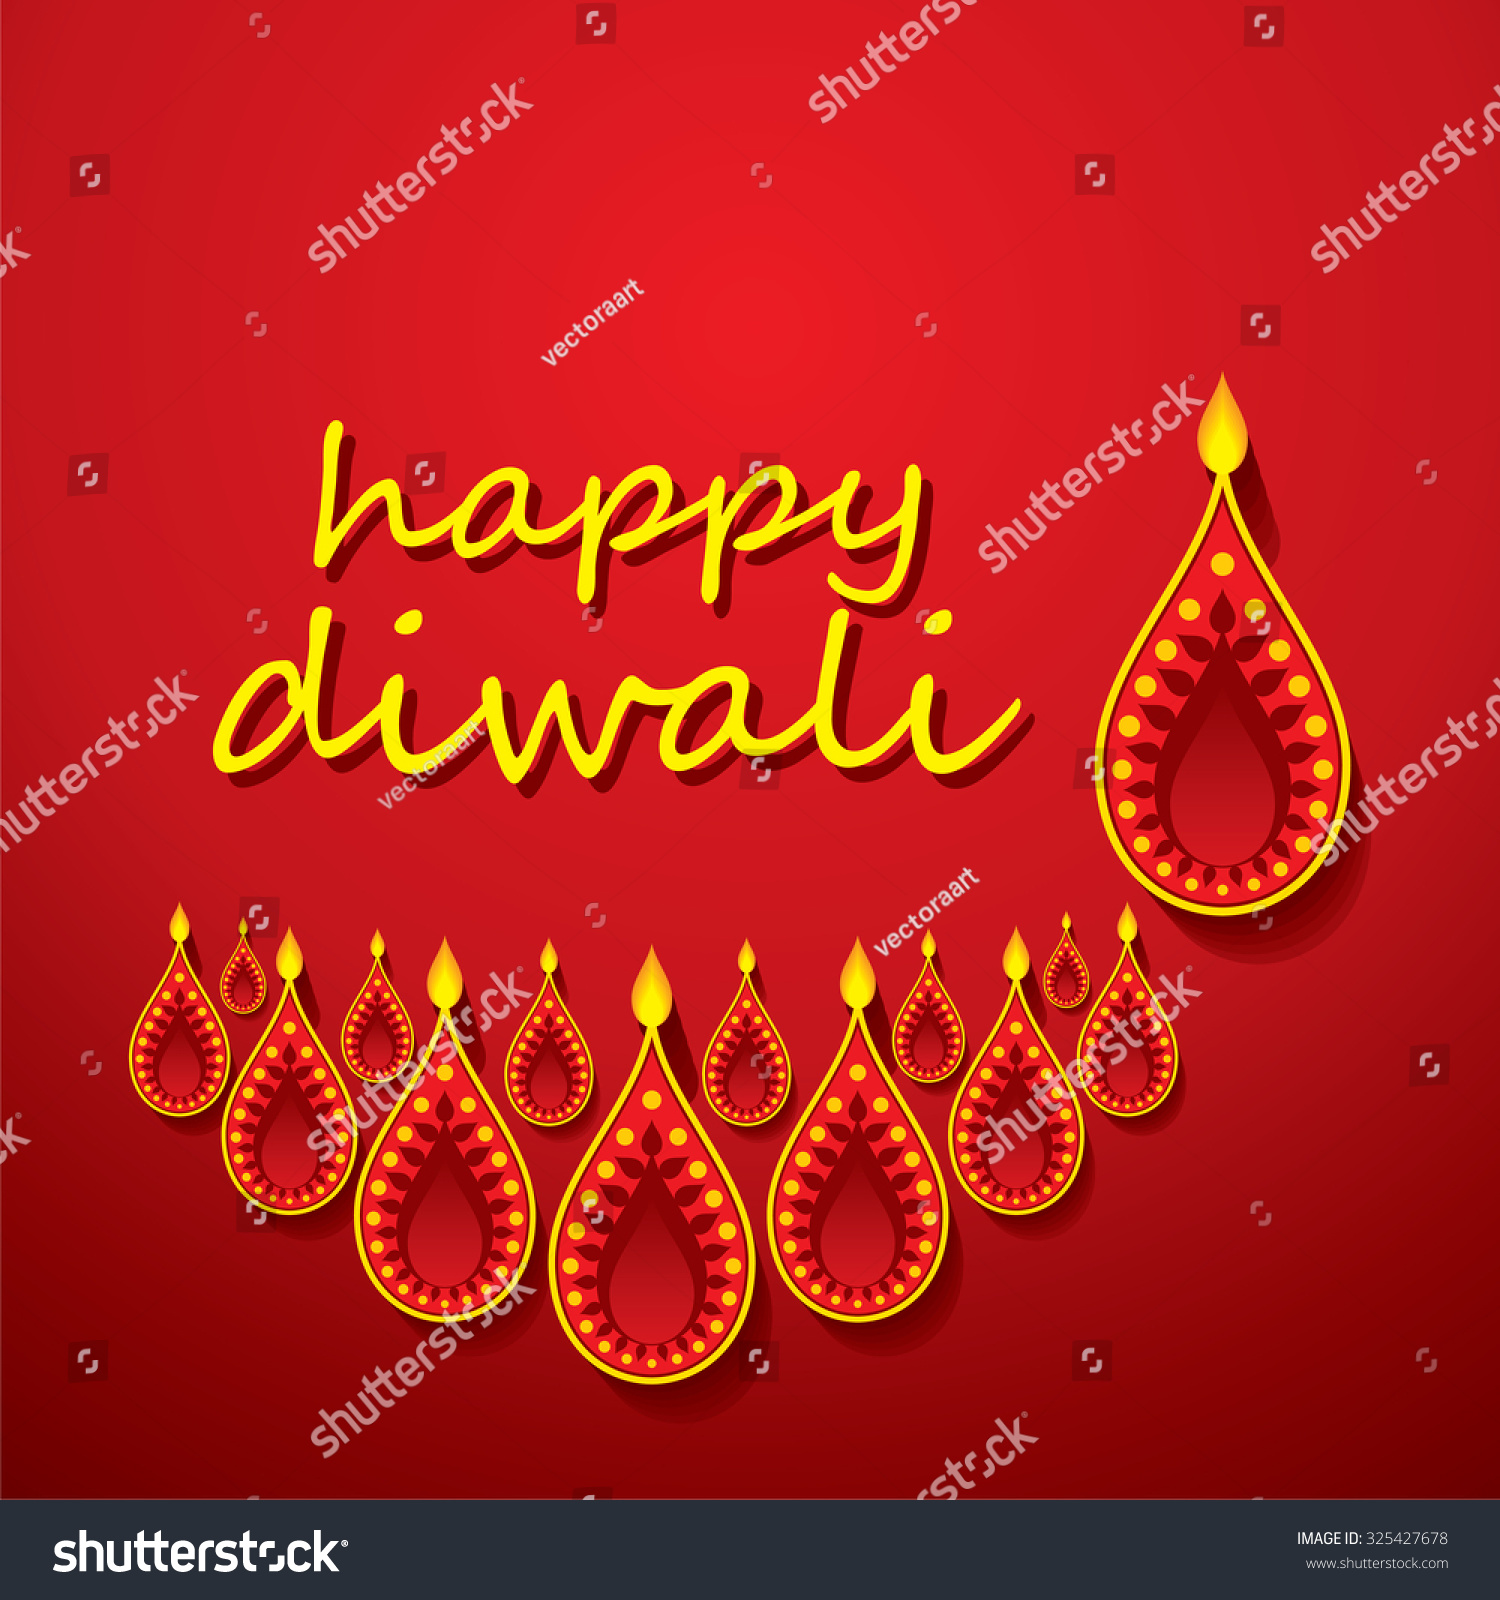 Vector Design Of Burning Diwali Diya For Greeting Card Ez Canvas